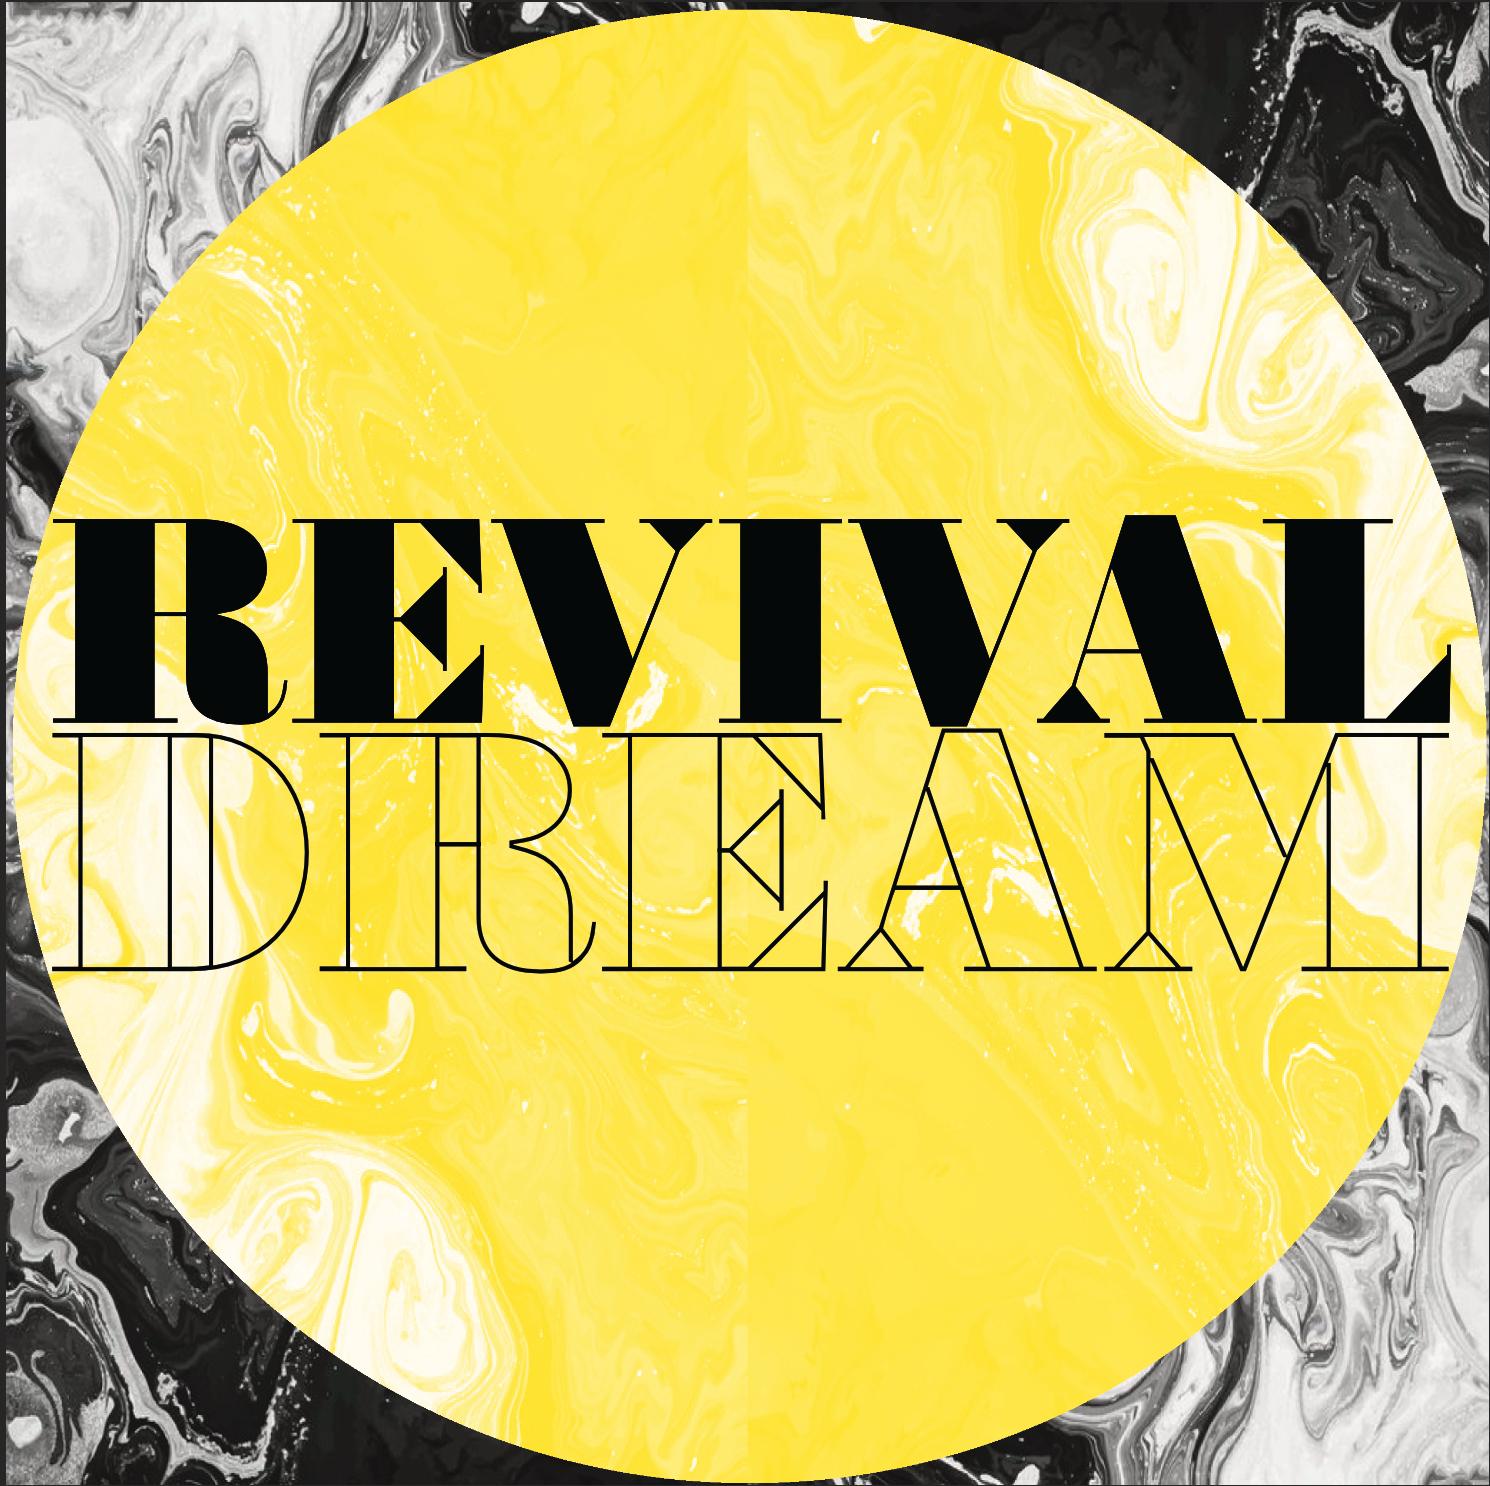 REVIVAL DREAM ALBUM – IG/FB/YT PROMO (v slovenčine)